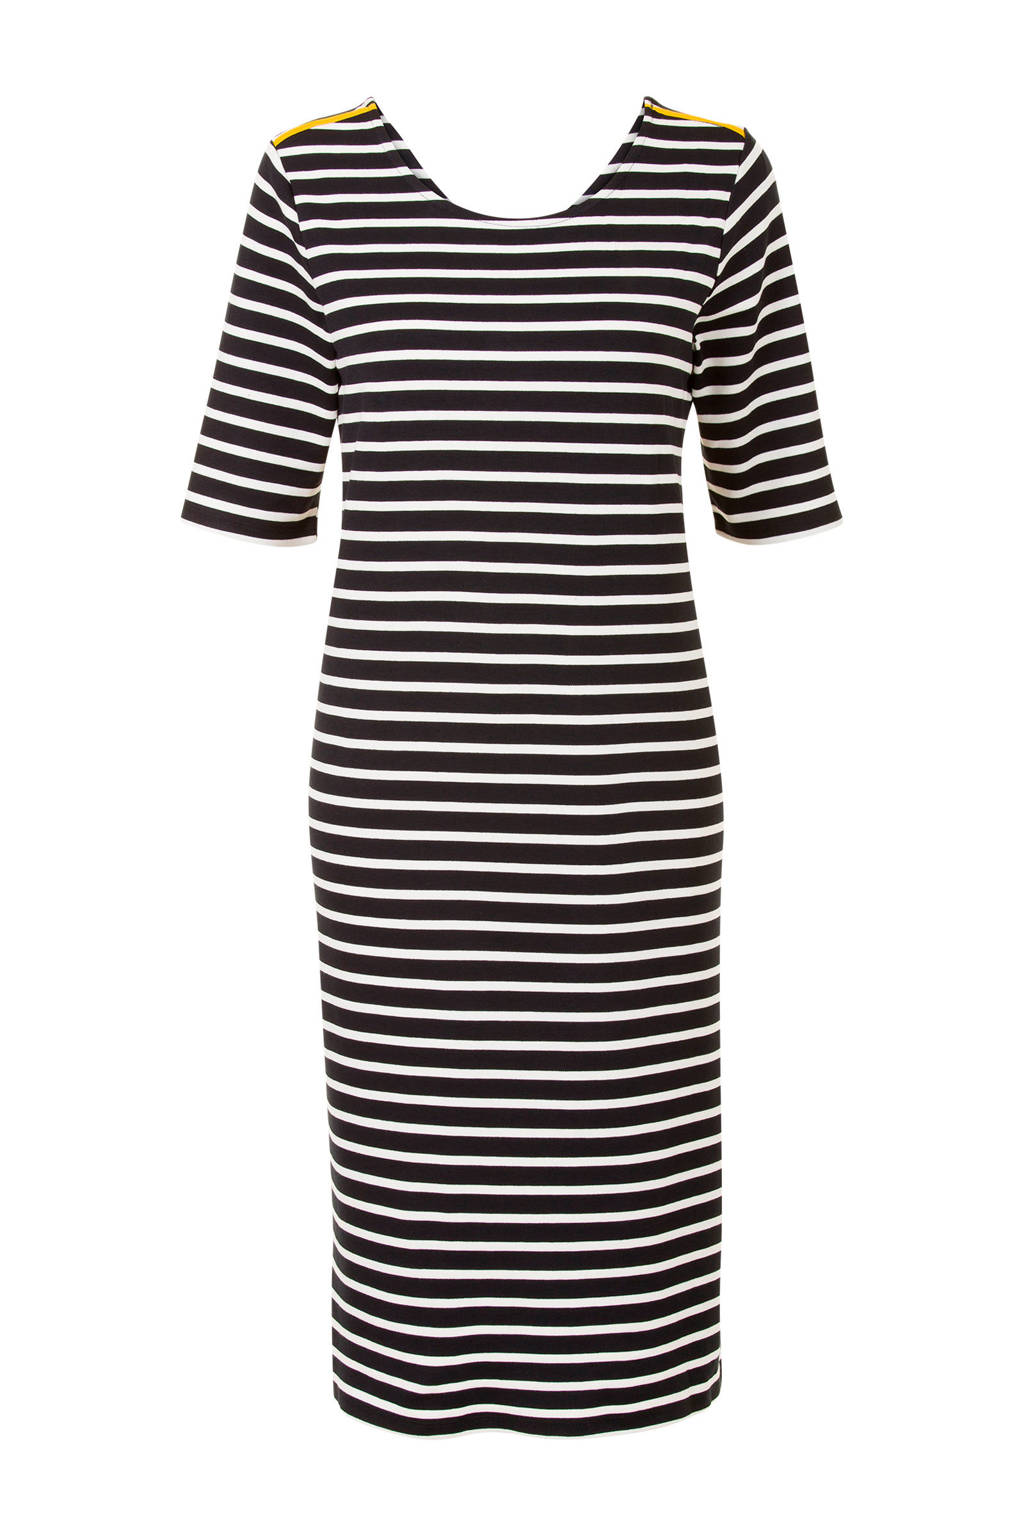 Miss Etam Lang gestreepte jurk, Zwart/wit/geel